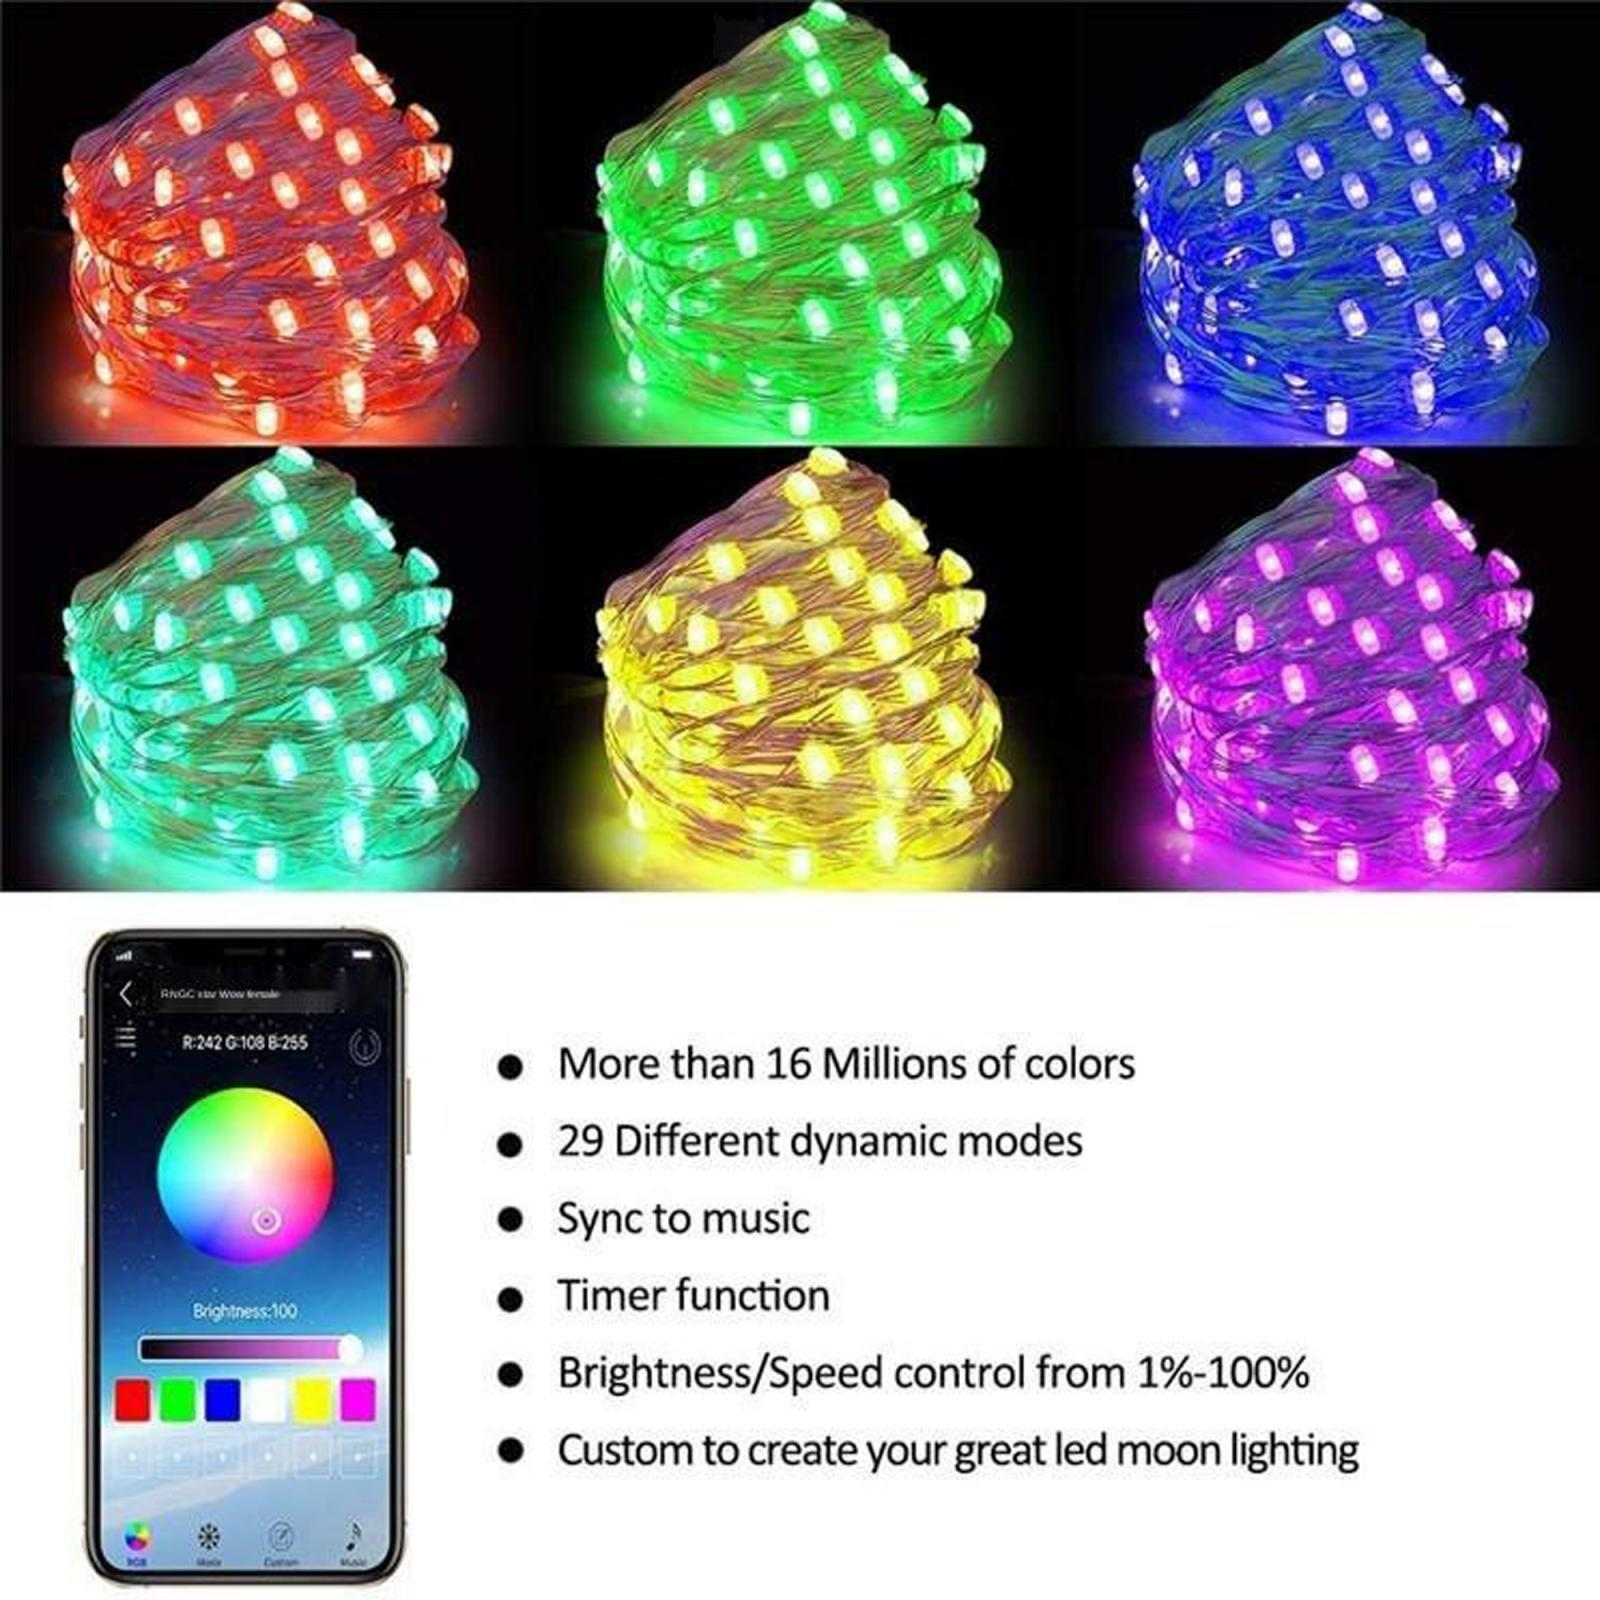 miniature 14 - LED Fée Guirlande Lumineuse Rideau Fenêtre De Mariage Party Decor App Contrôl